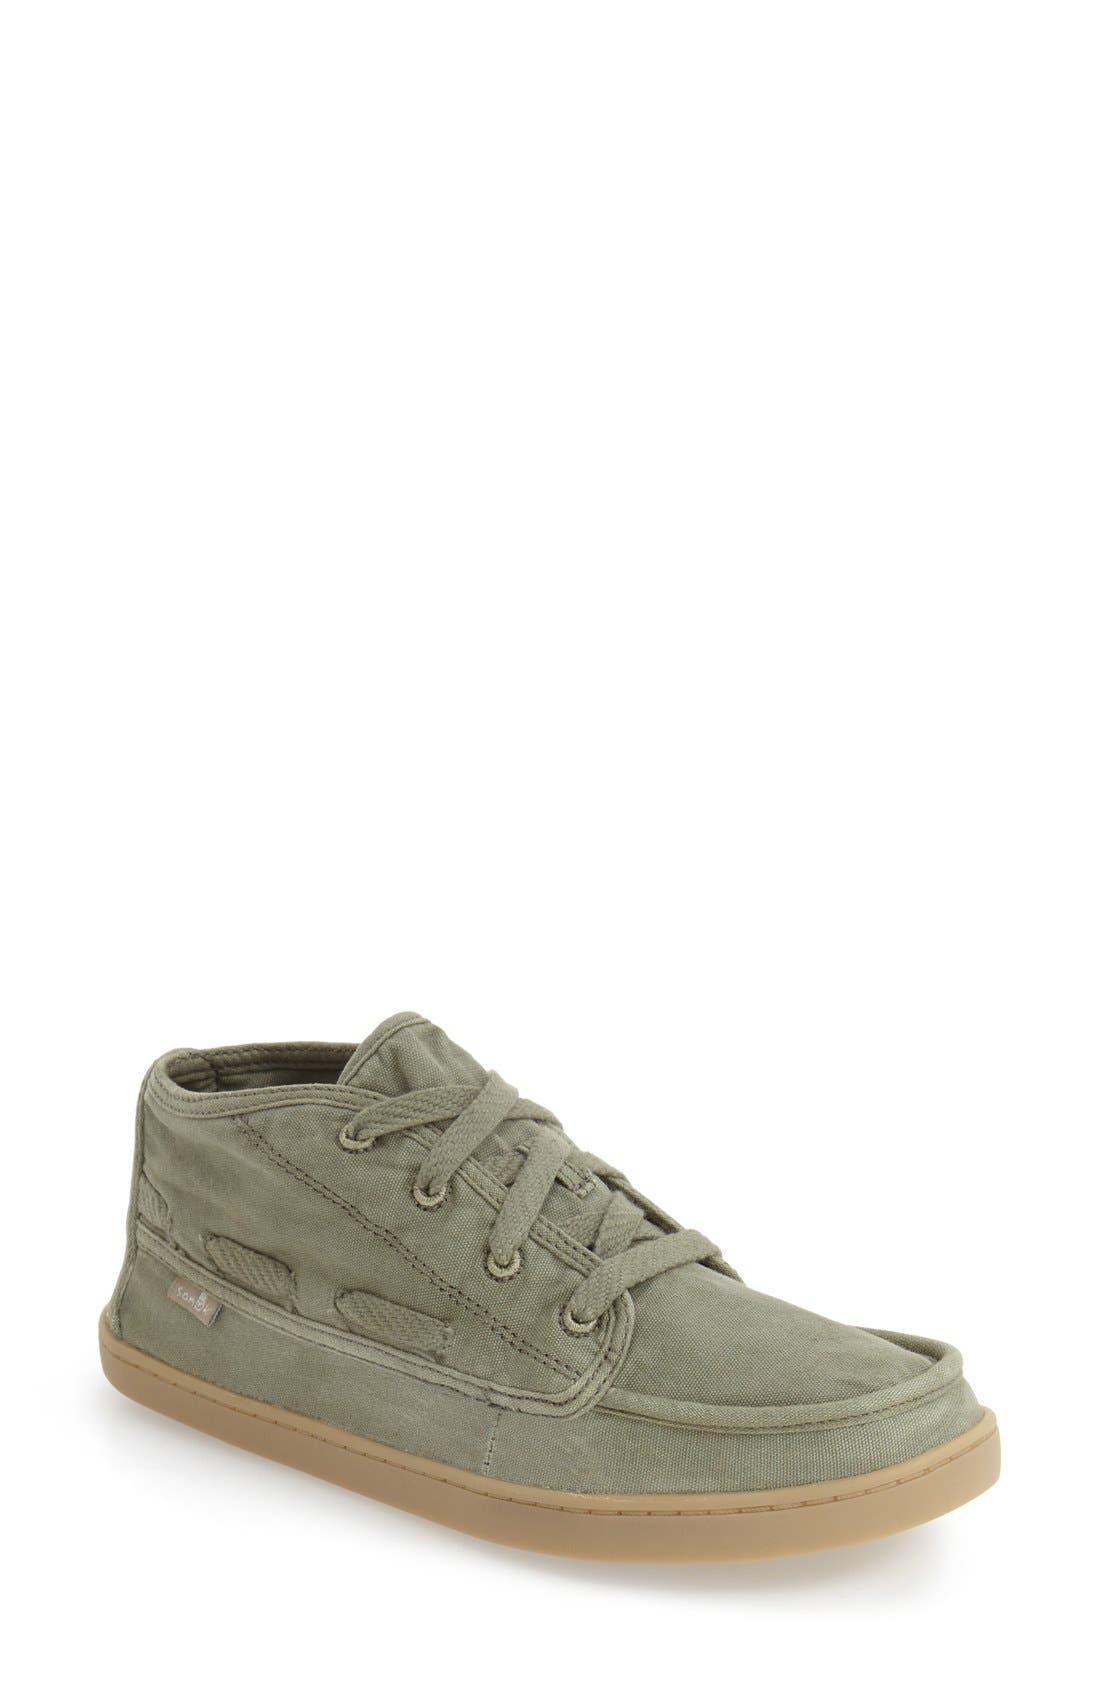 'Vee K Shawn' High Top Sneaker,                             Main thumbnail 3, color,